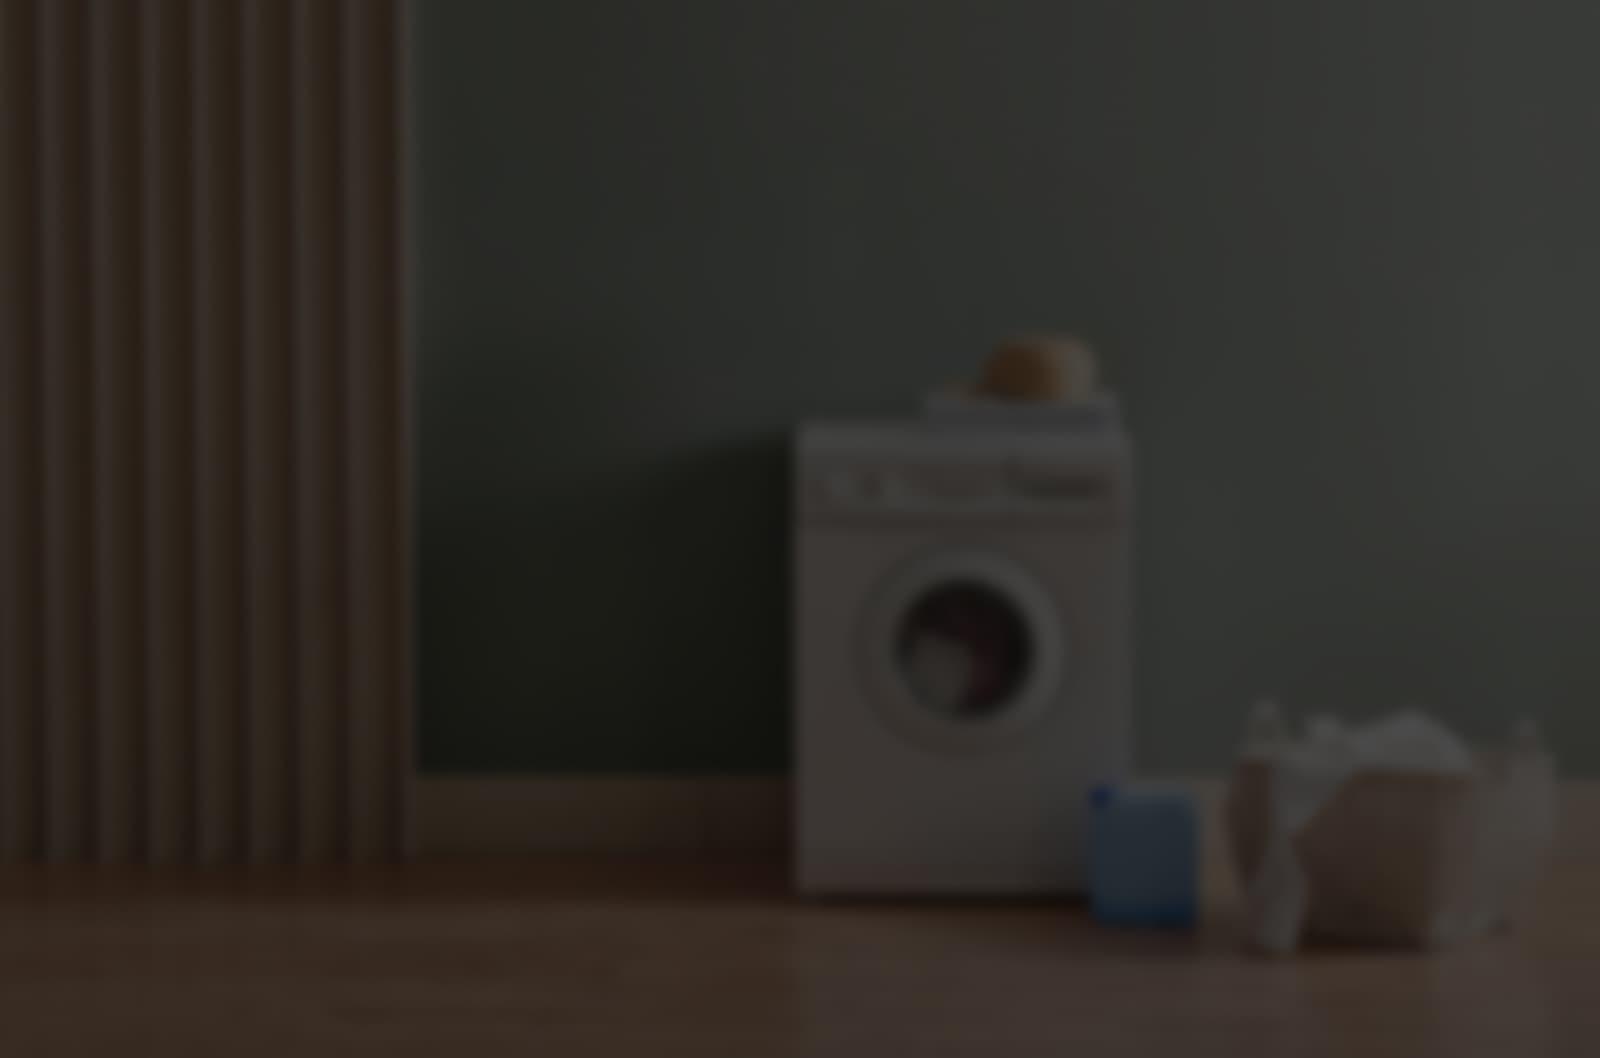 washing machine with things